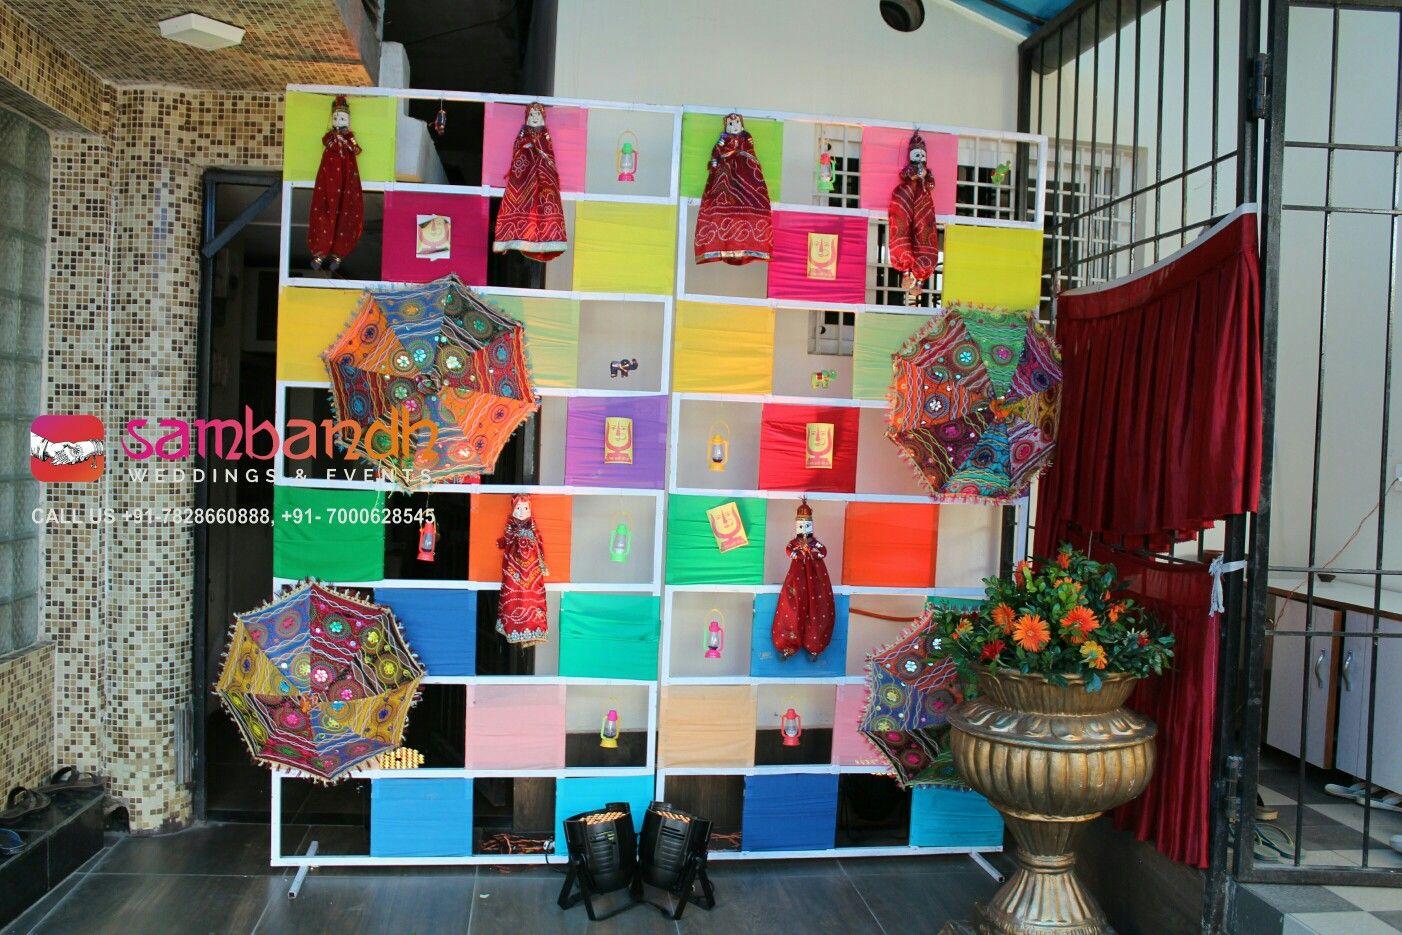 Rajasthani theme selfie station